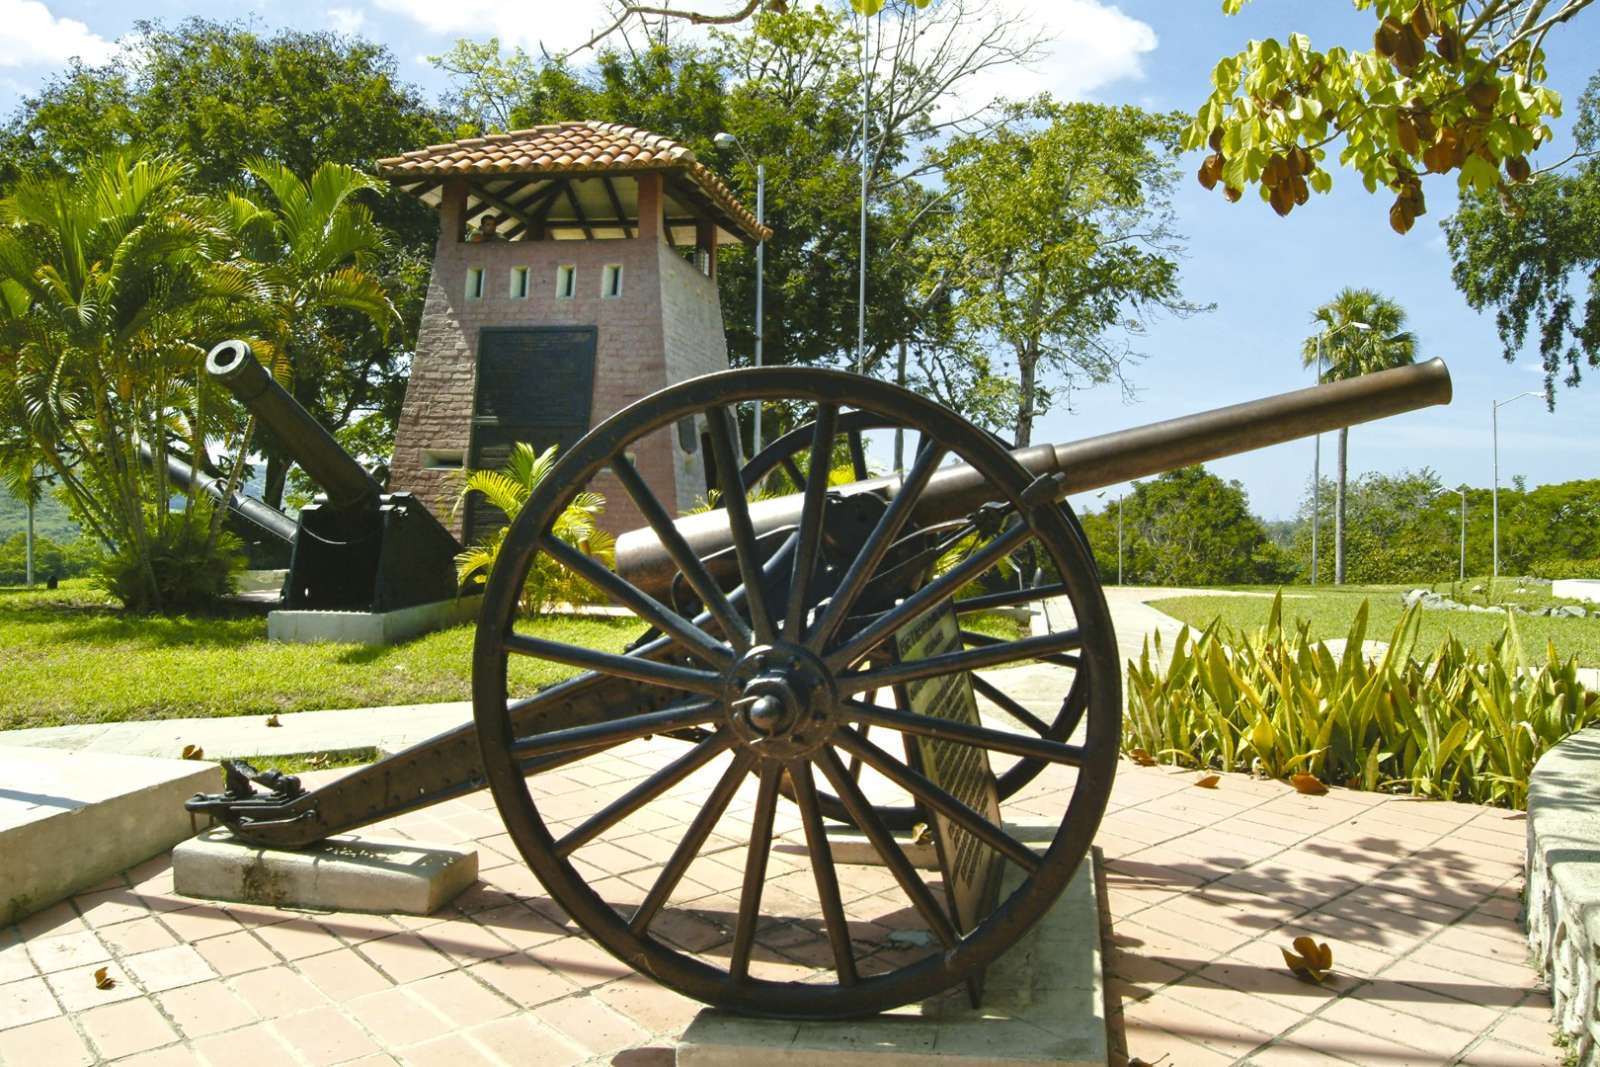 Santiago De Cuba Cannon